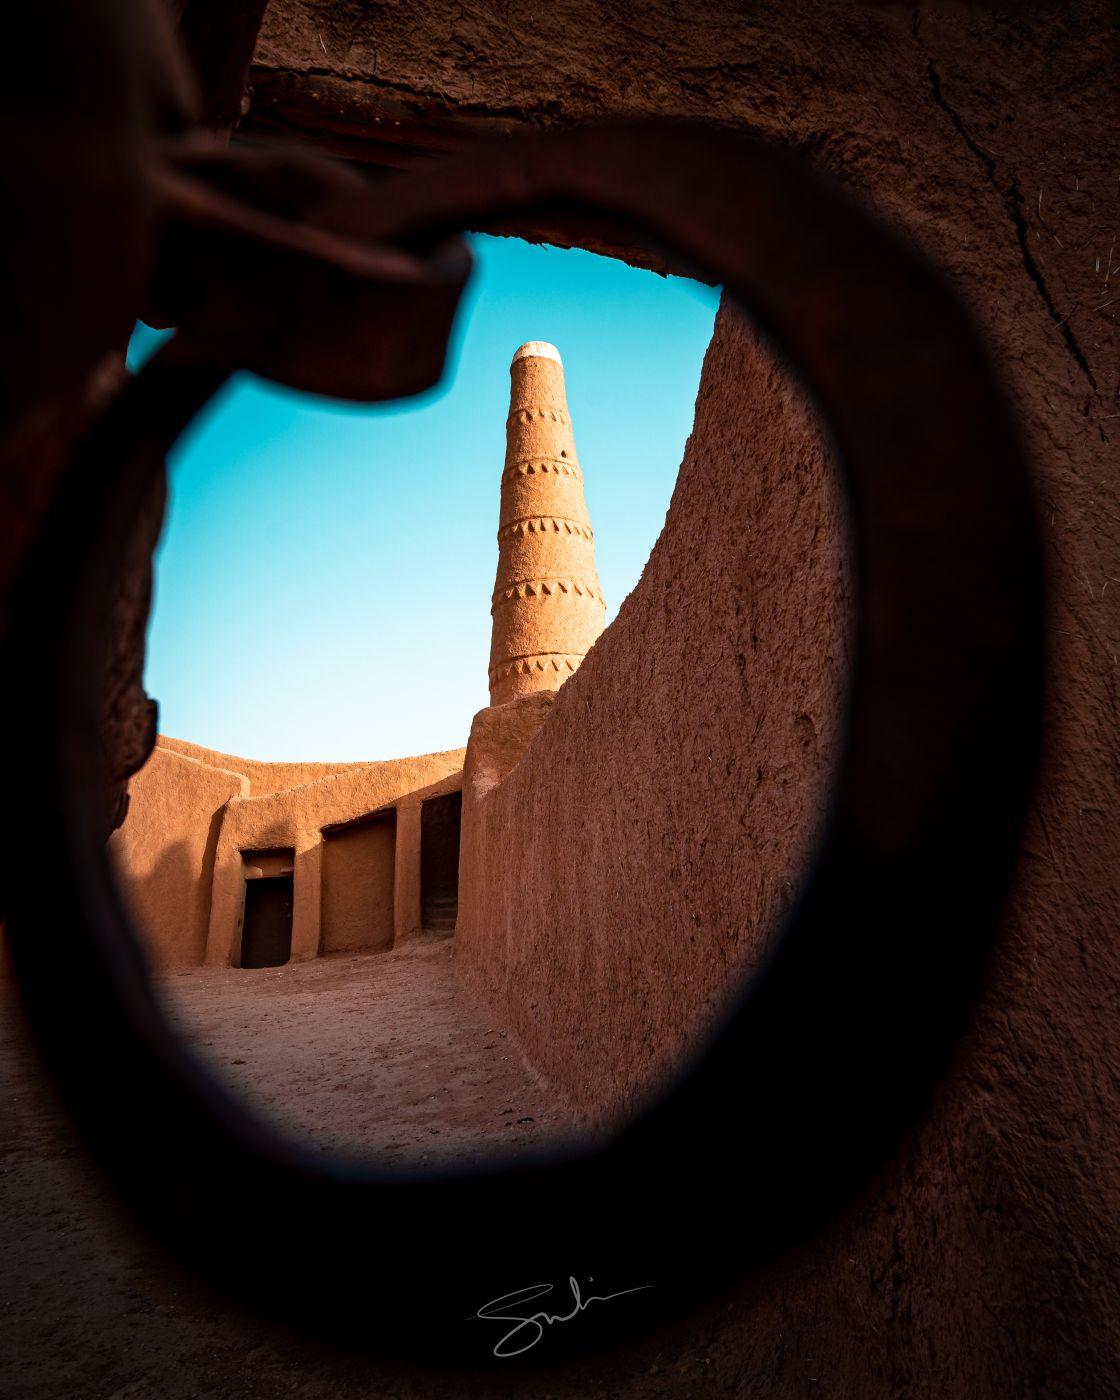 Mushrifah old mosque, Raudat Sudair, Saudi Arabia